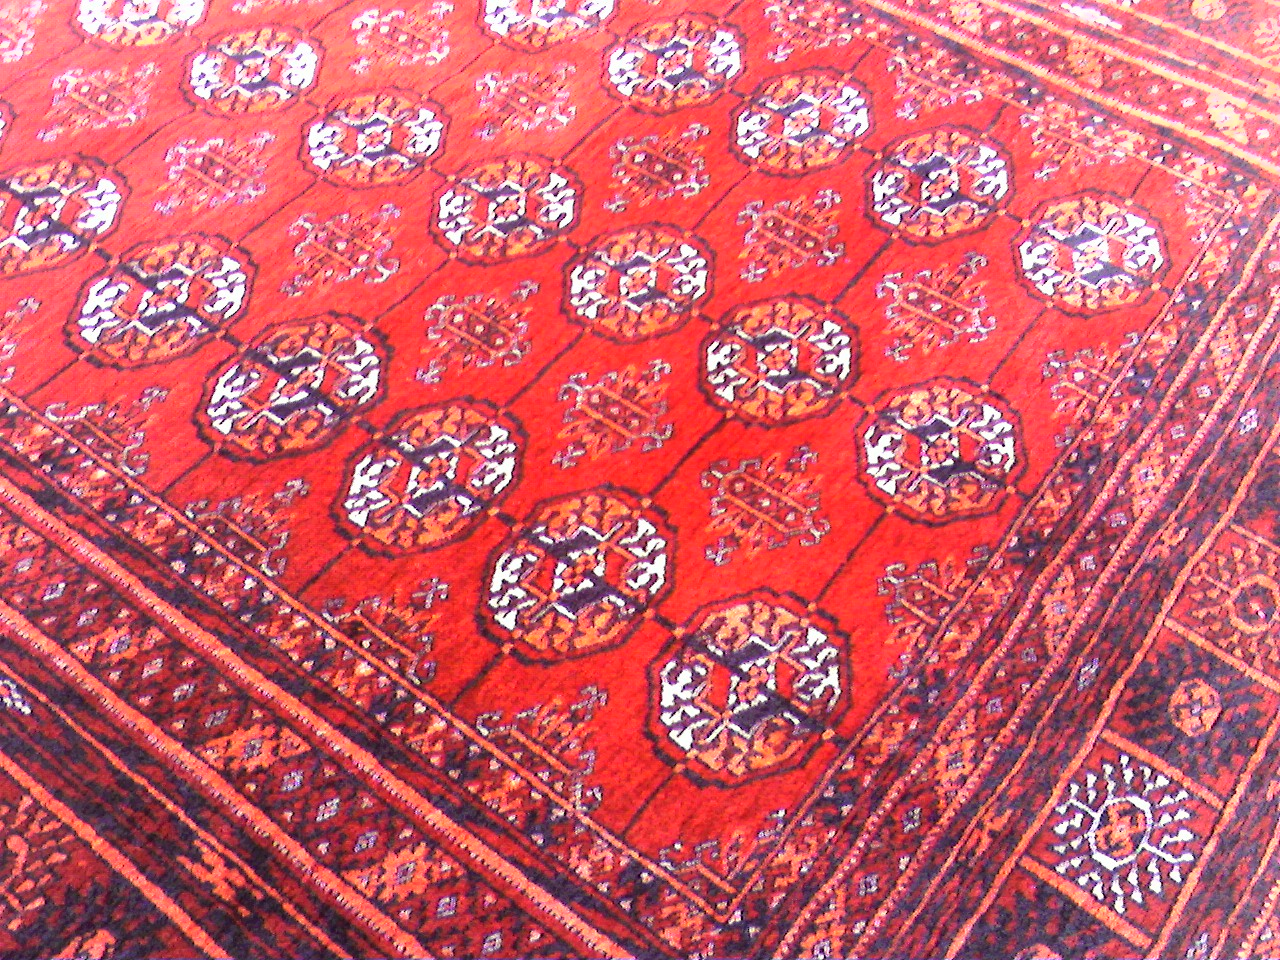 Imagining Islamic Aesthetics 4 Oriental Carpets Stars